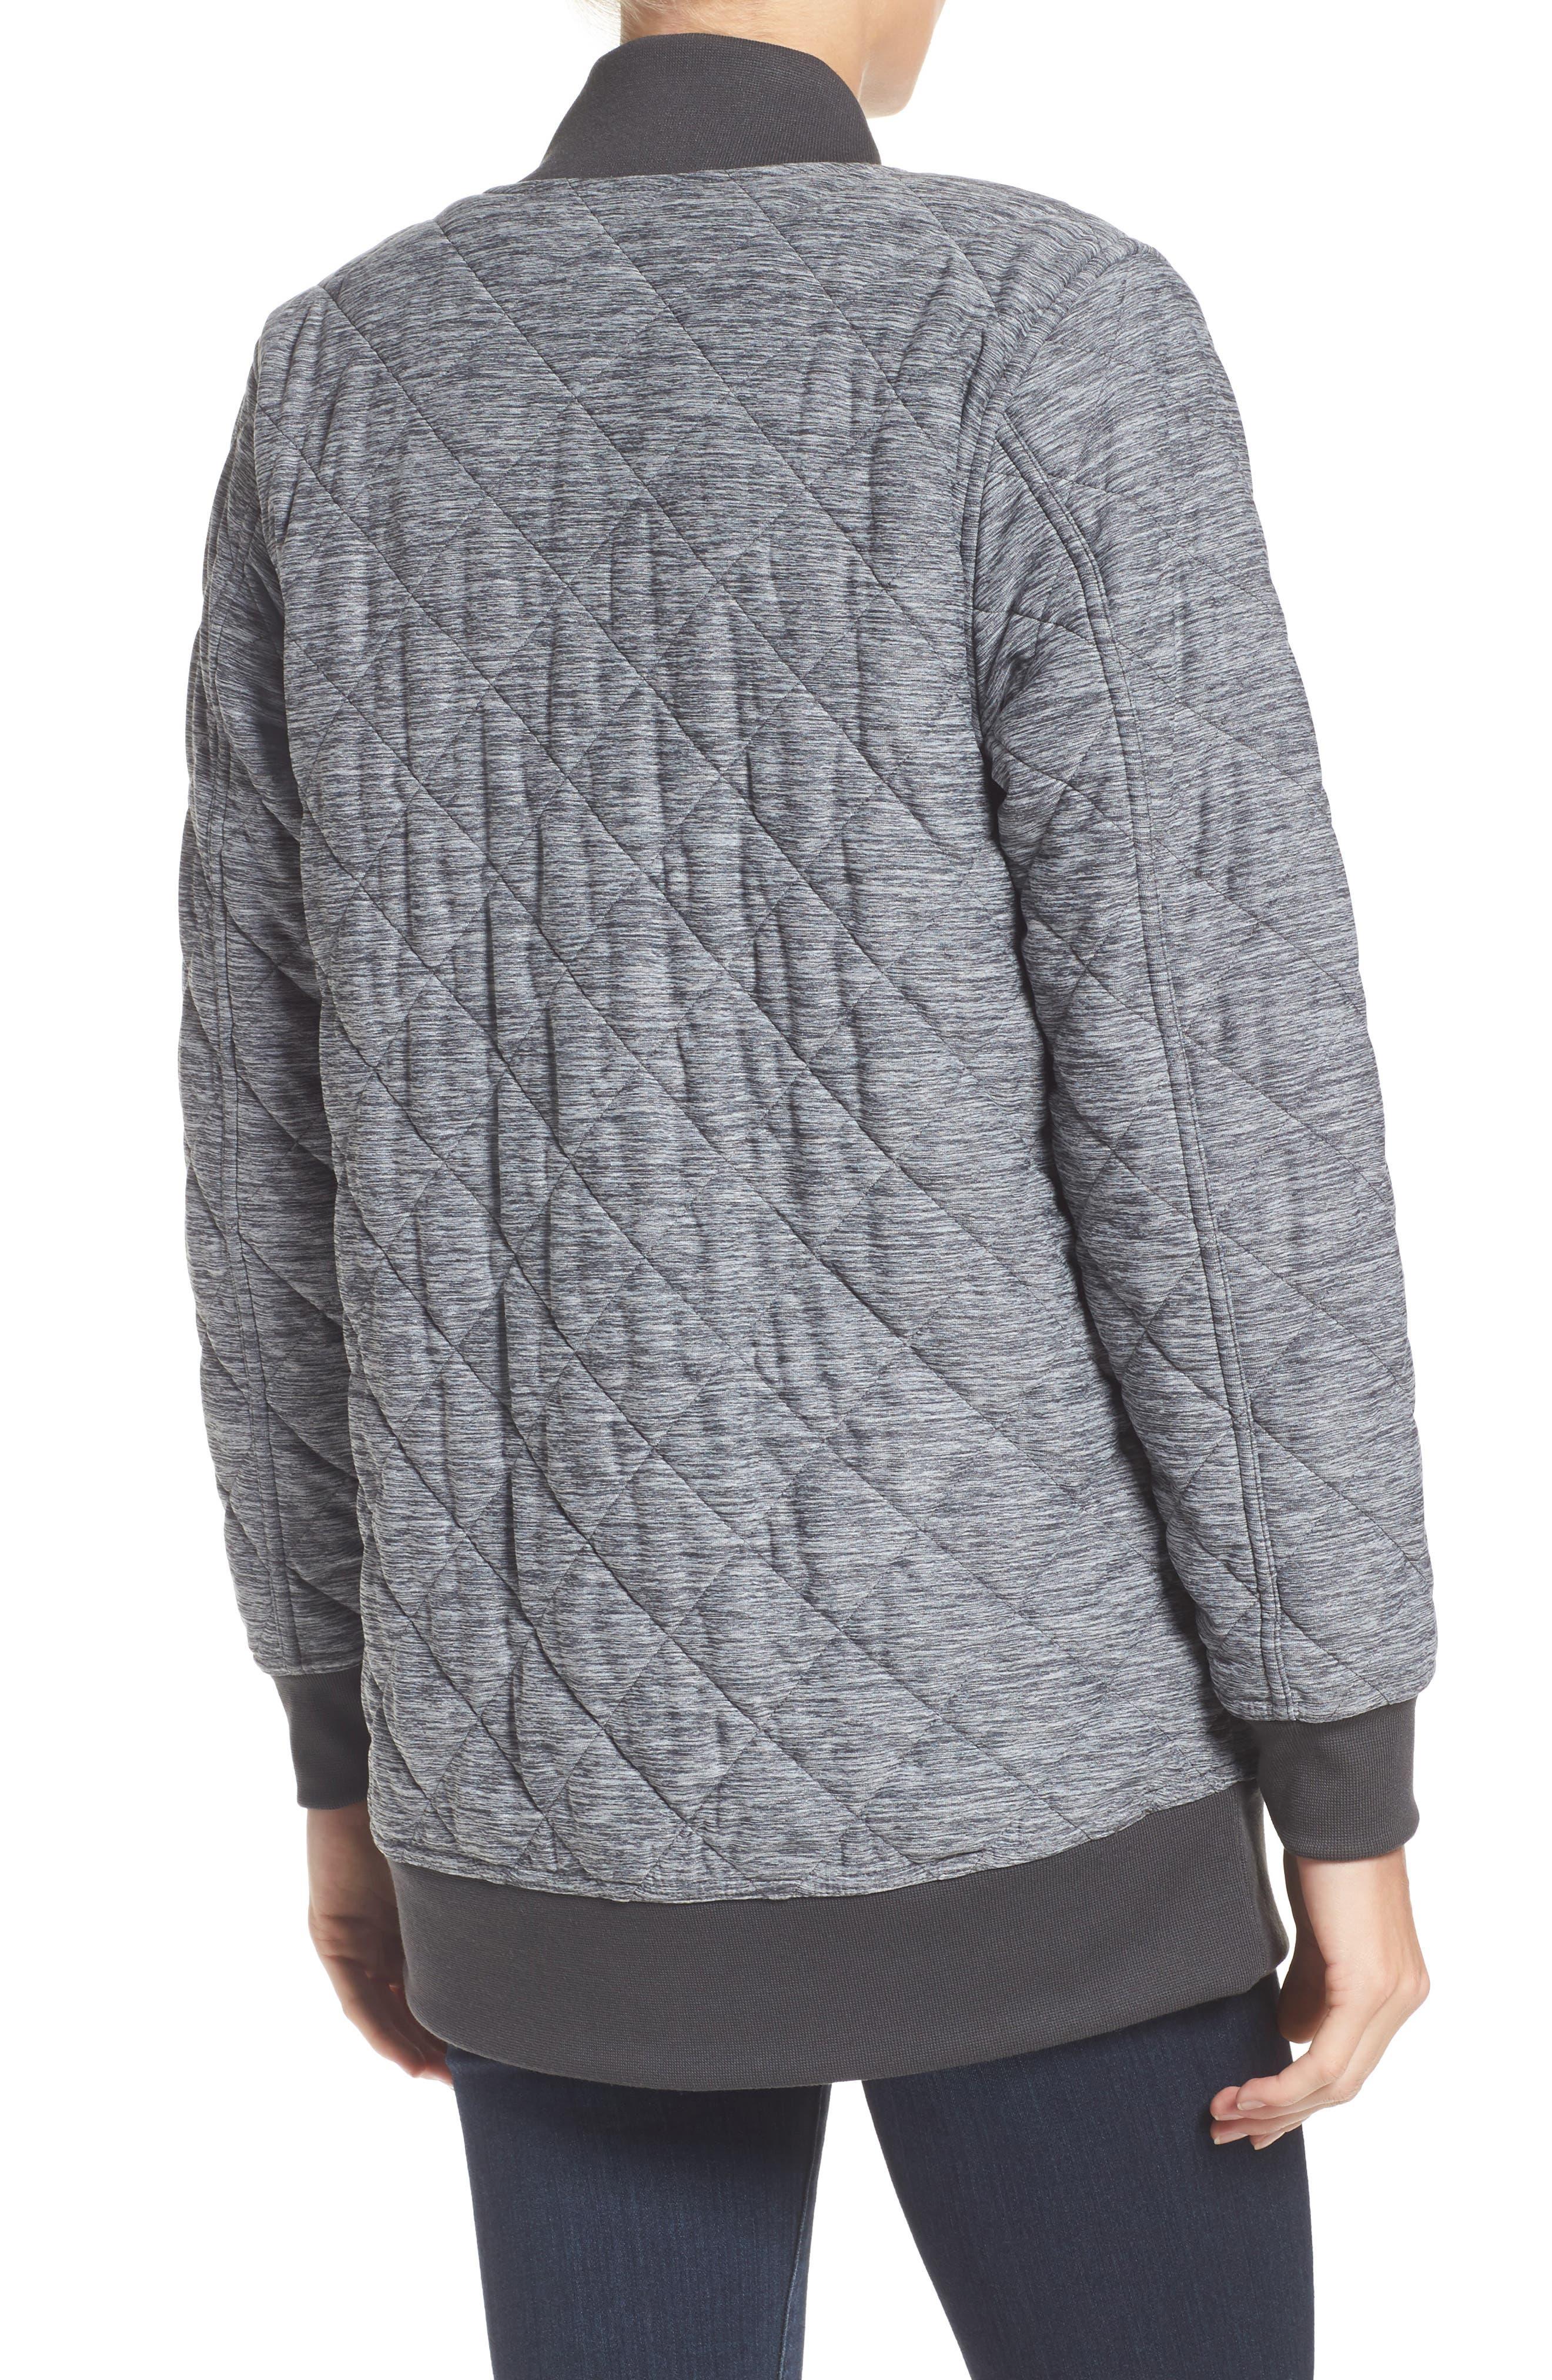 Mod Insulated Knit Jacket,                             Alternate thumbnail 3, color,                             Tnf Dark Grey Heather